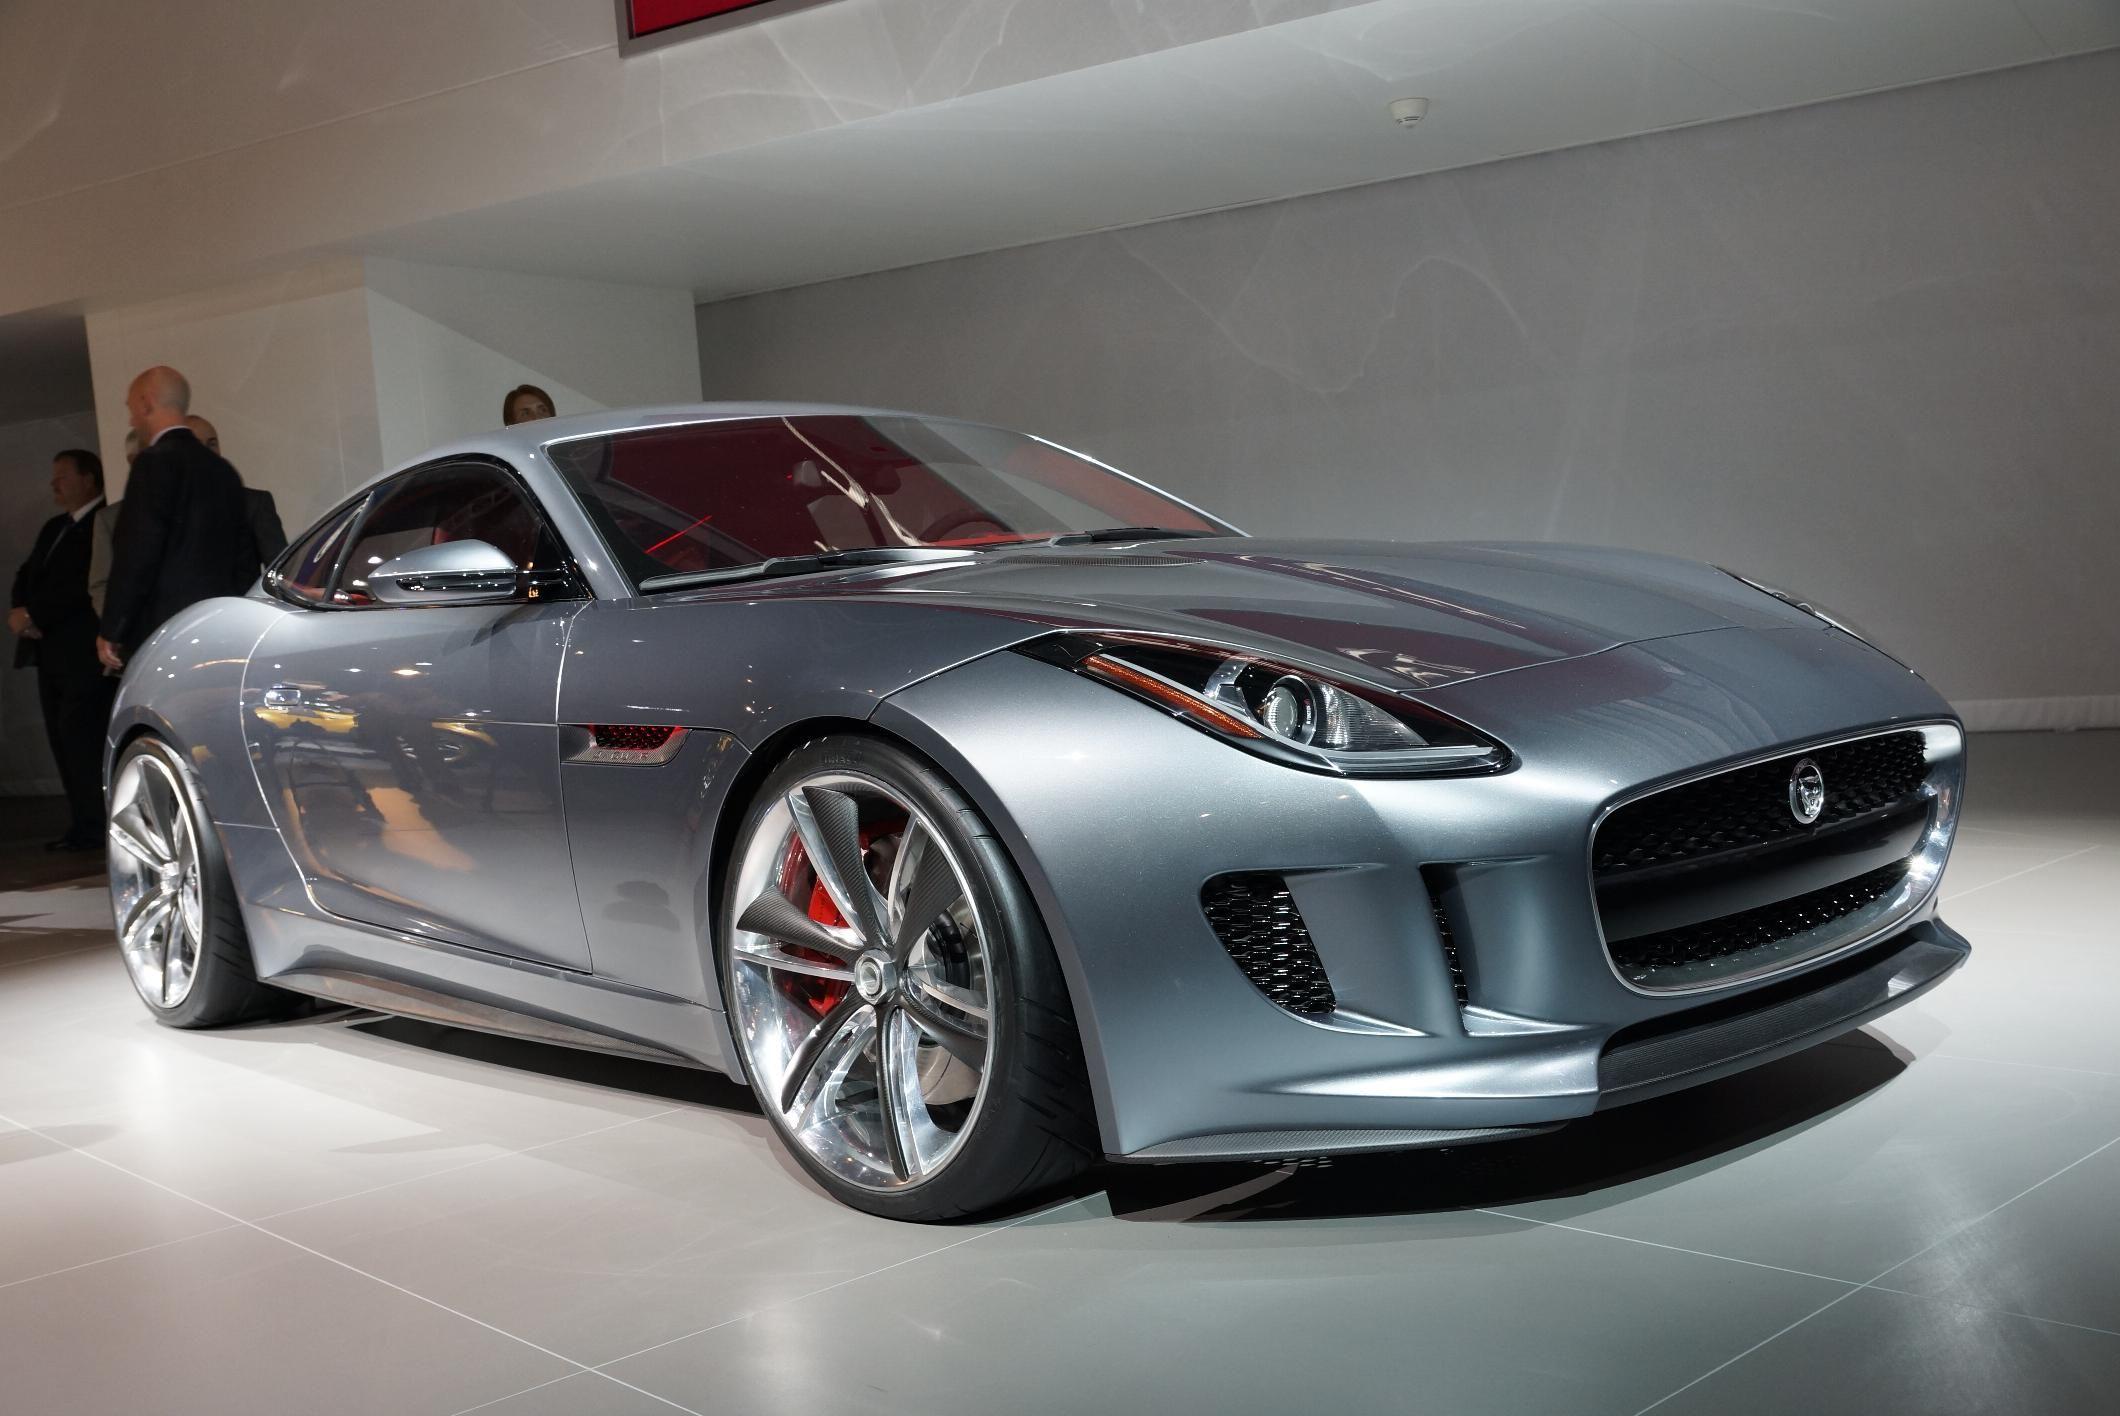 jaguar f type News Jaguar's new sports car is the F